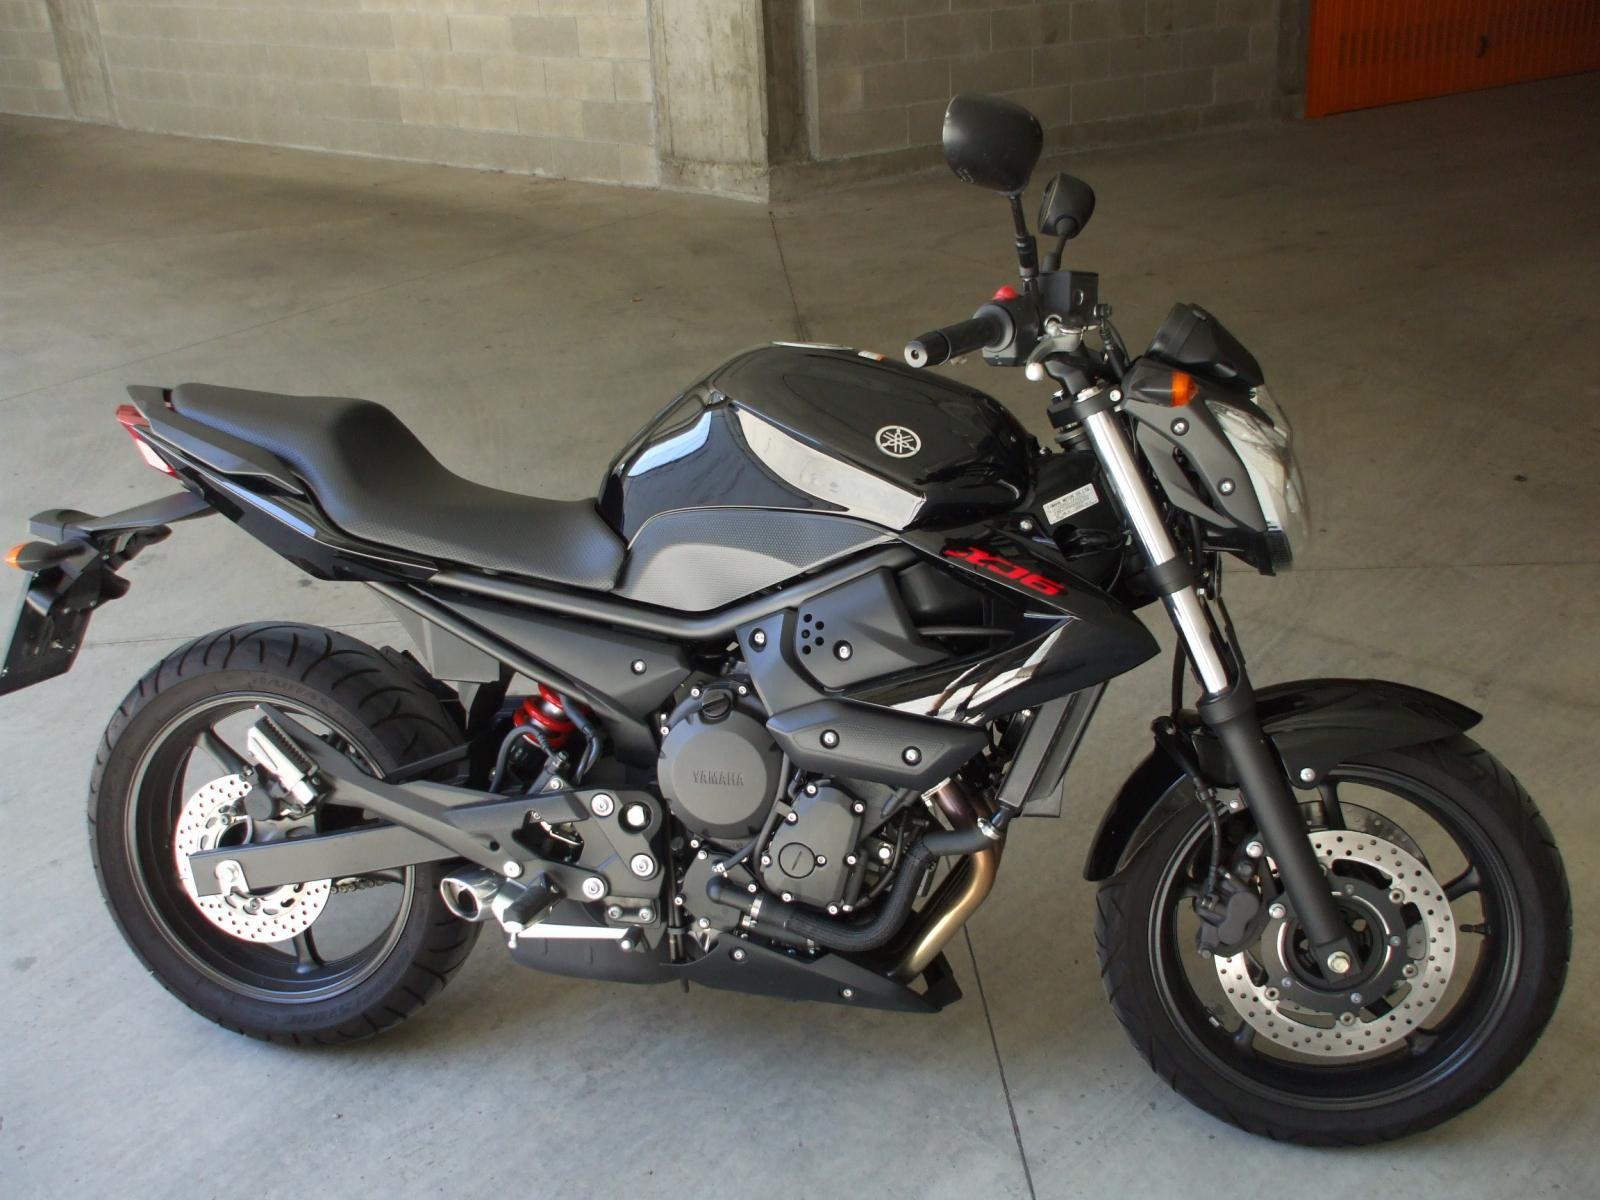 Yamaha Xj6 Moto Yamaha Xj6 Vendo Usato A Torino 4 400 Http Www Insella It Annuncio Yamaha Xj6 112476 Xj6 Yamaha Xj6